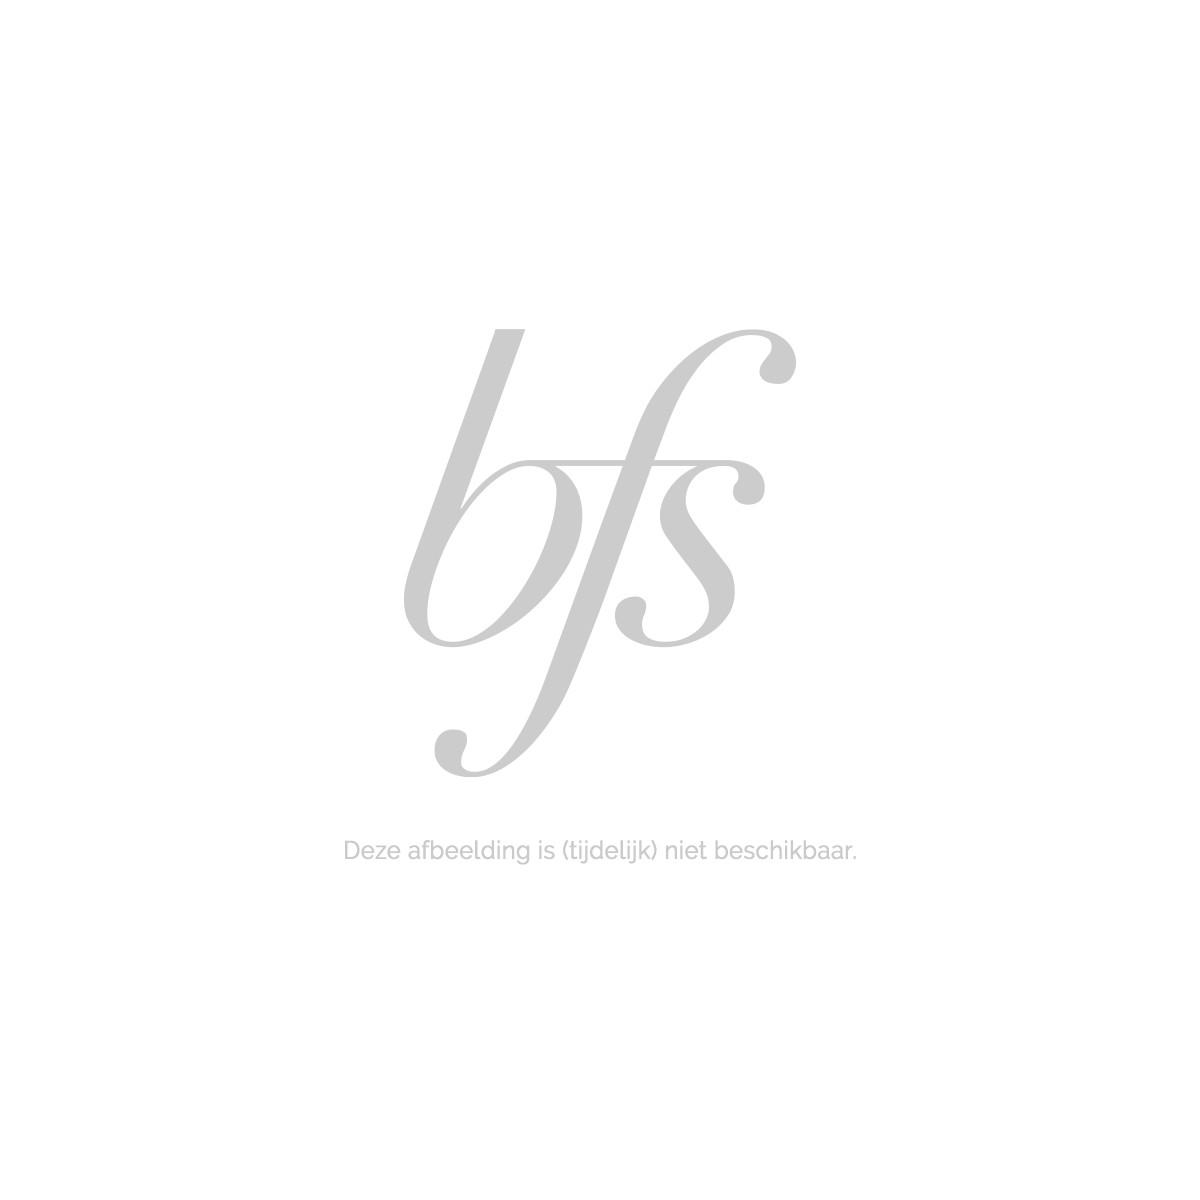 Afbeelding van Beautyblender Pro Kit Sponsjes Make up